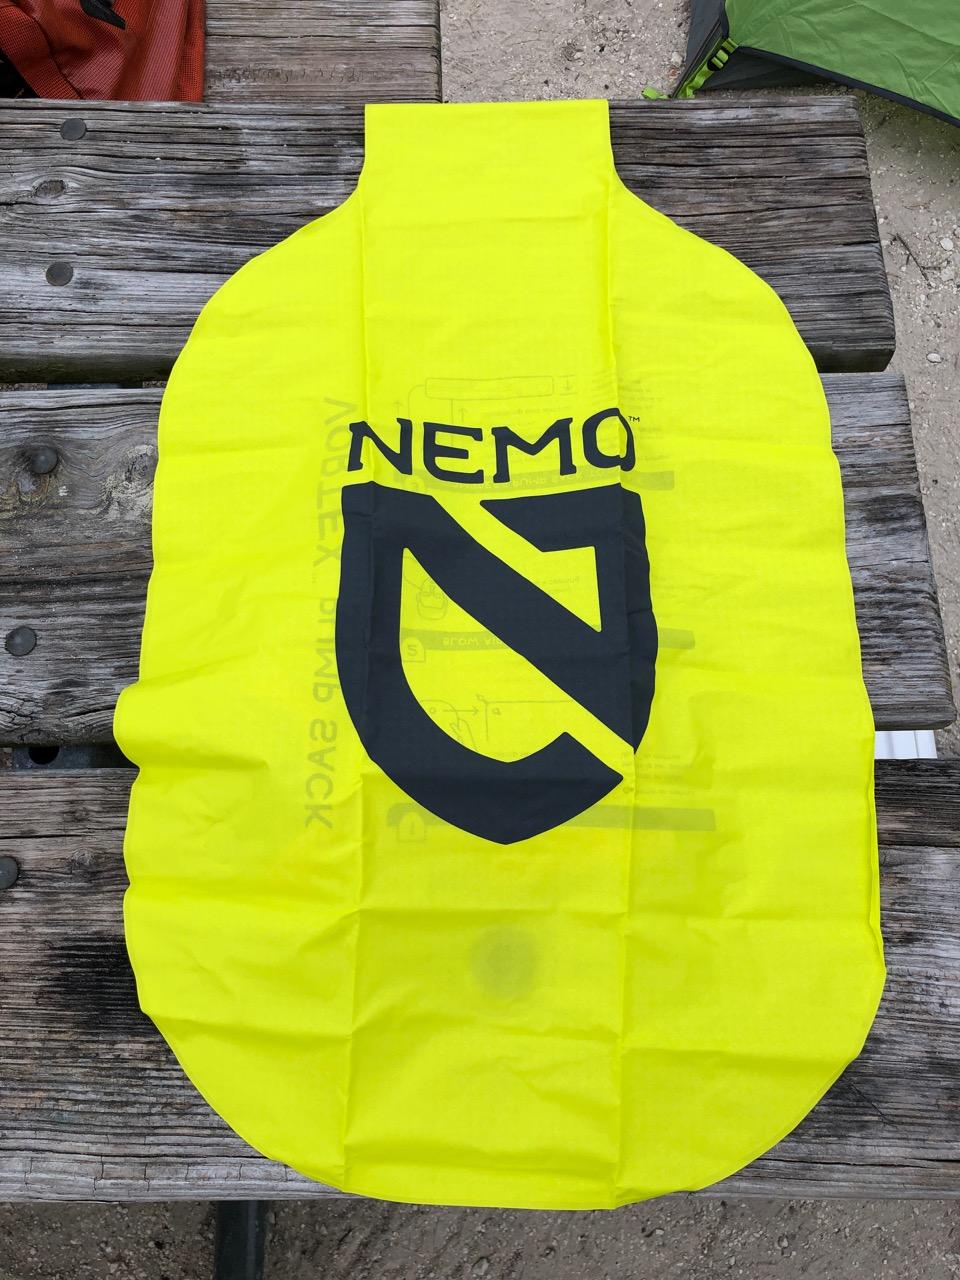 NEMO Tensor Regular Insulated Ultralight Sleeping Pad (2019) Vortex Inflation Sack (Front)